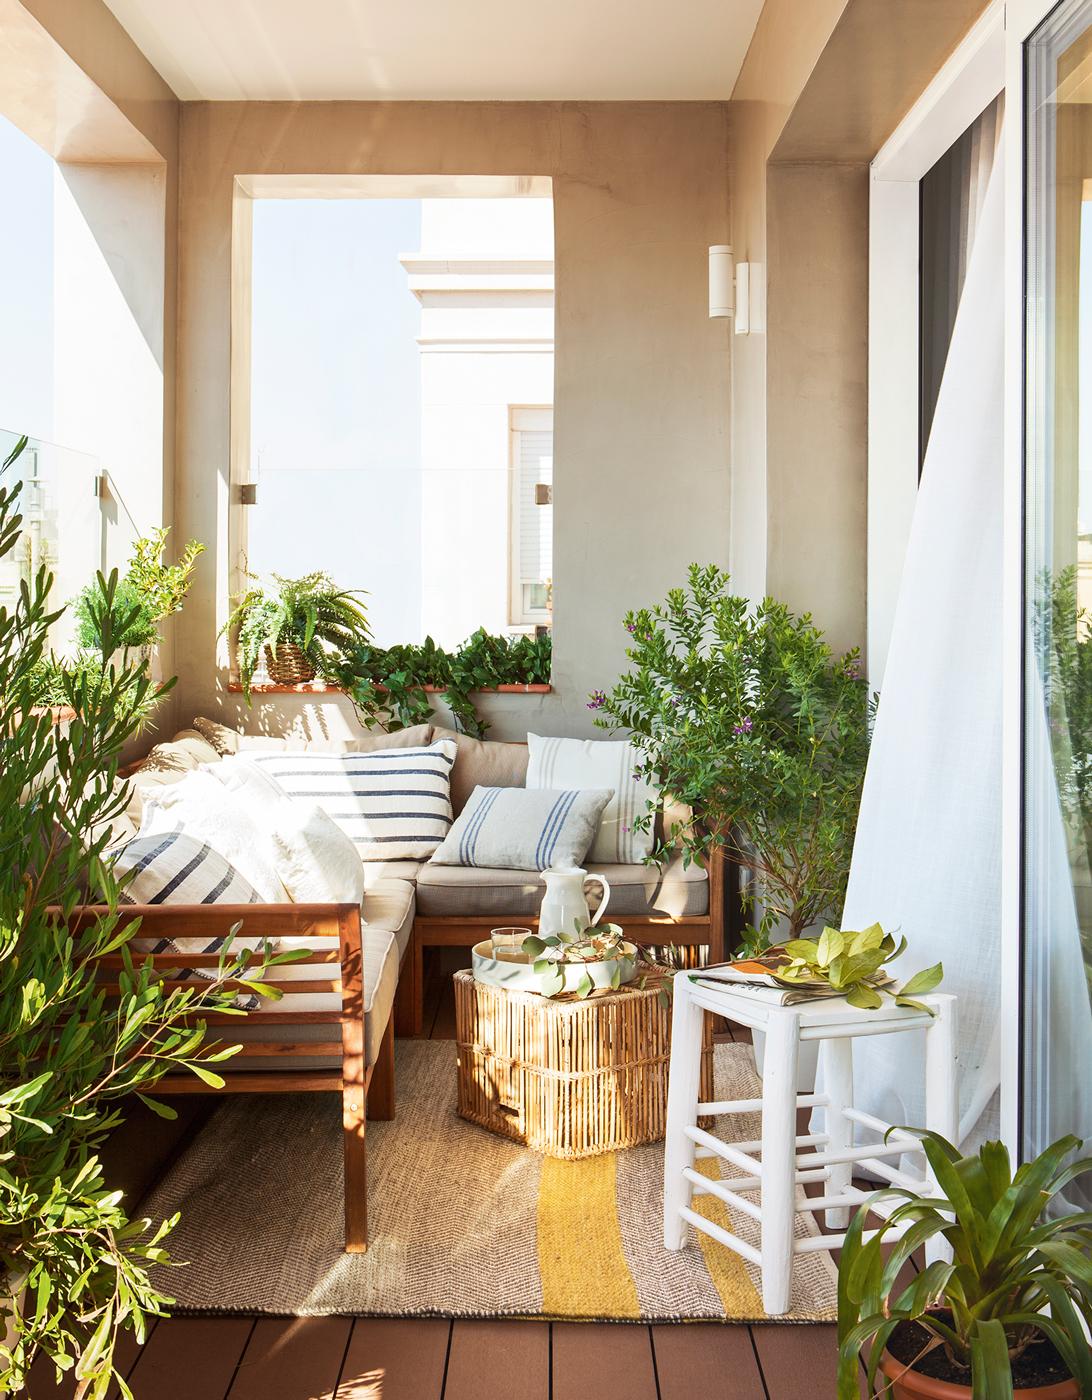 10 terrazas peque as pero bien aprovechadas for Piedras pequenas para decorar